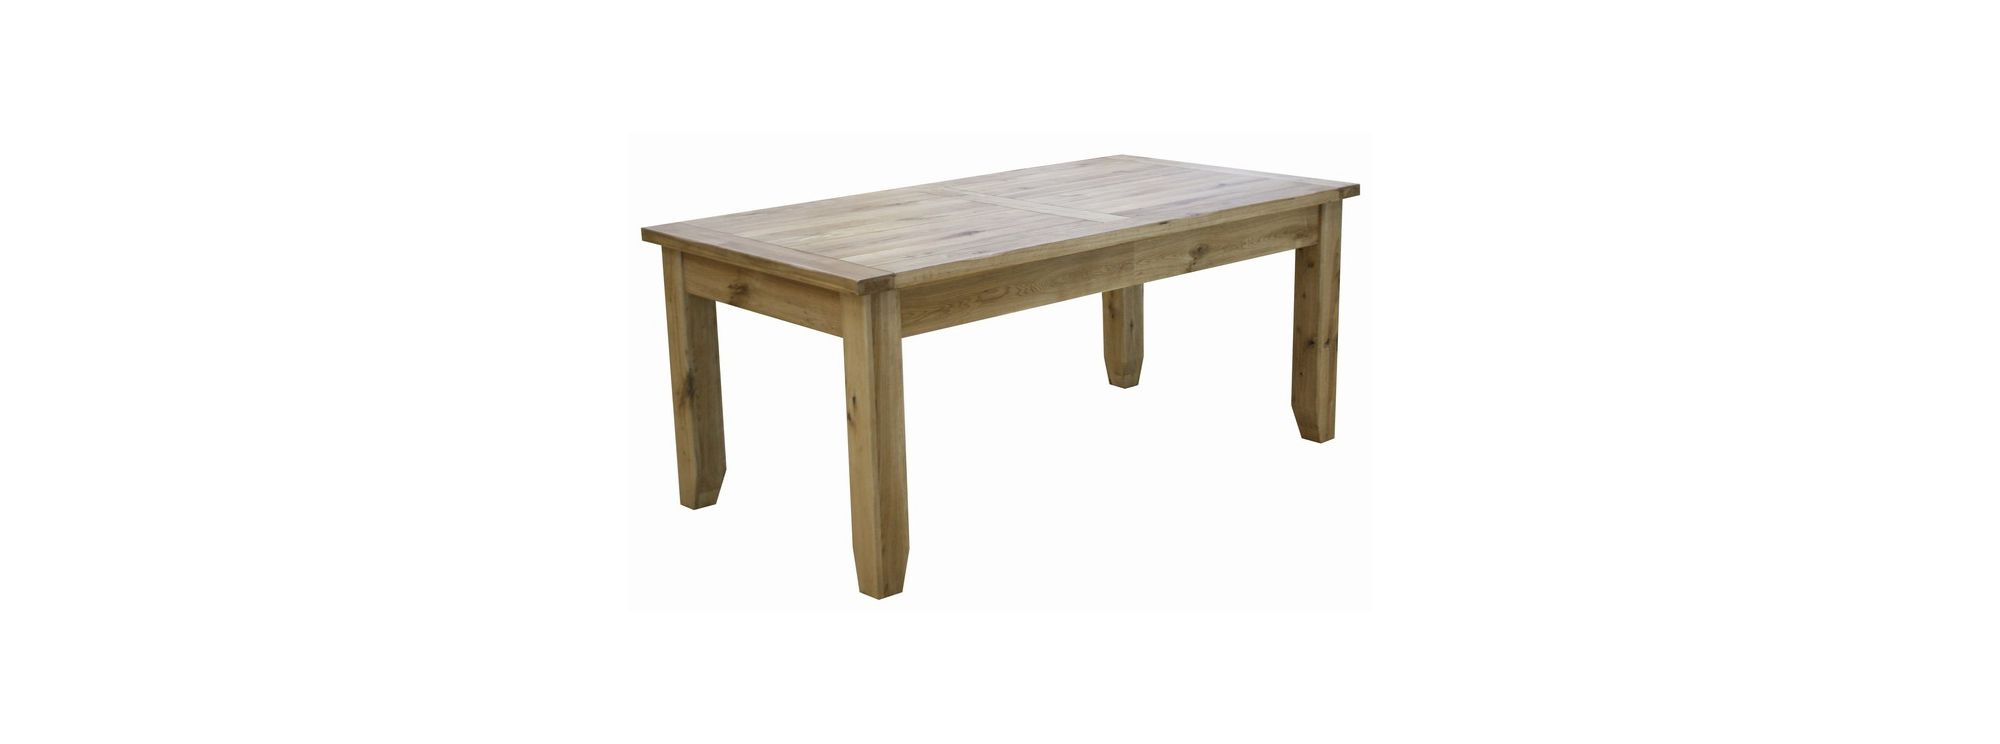 Extending Table 187 Tesco Extending Tables : 421 9287PI1000190MNwid2000amphei2000 from extendingtable.co.uk size 2000 x 2000 jpeg 45kB